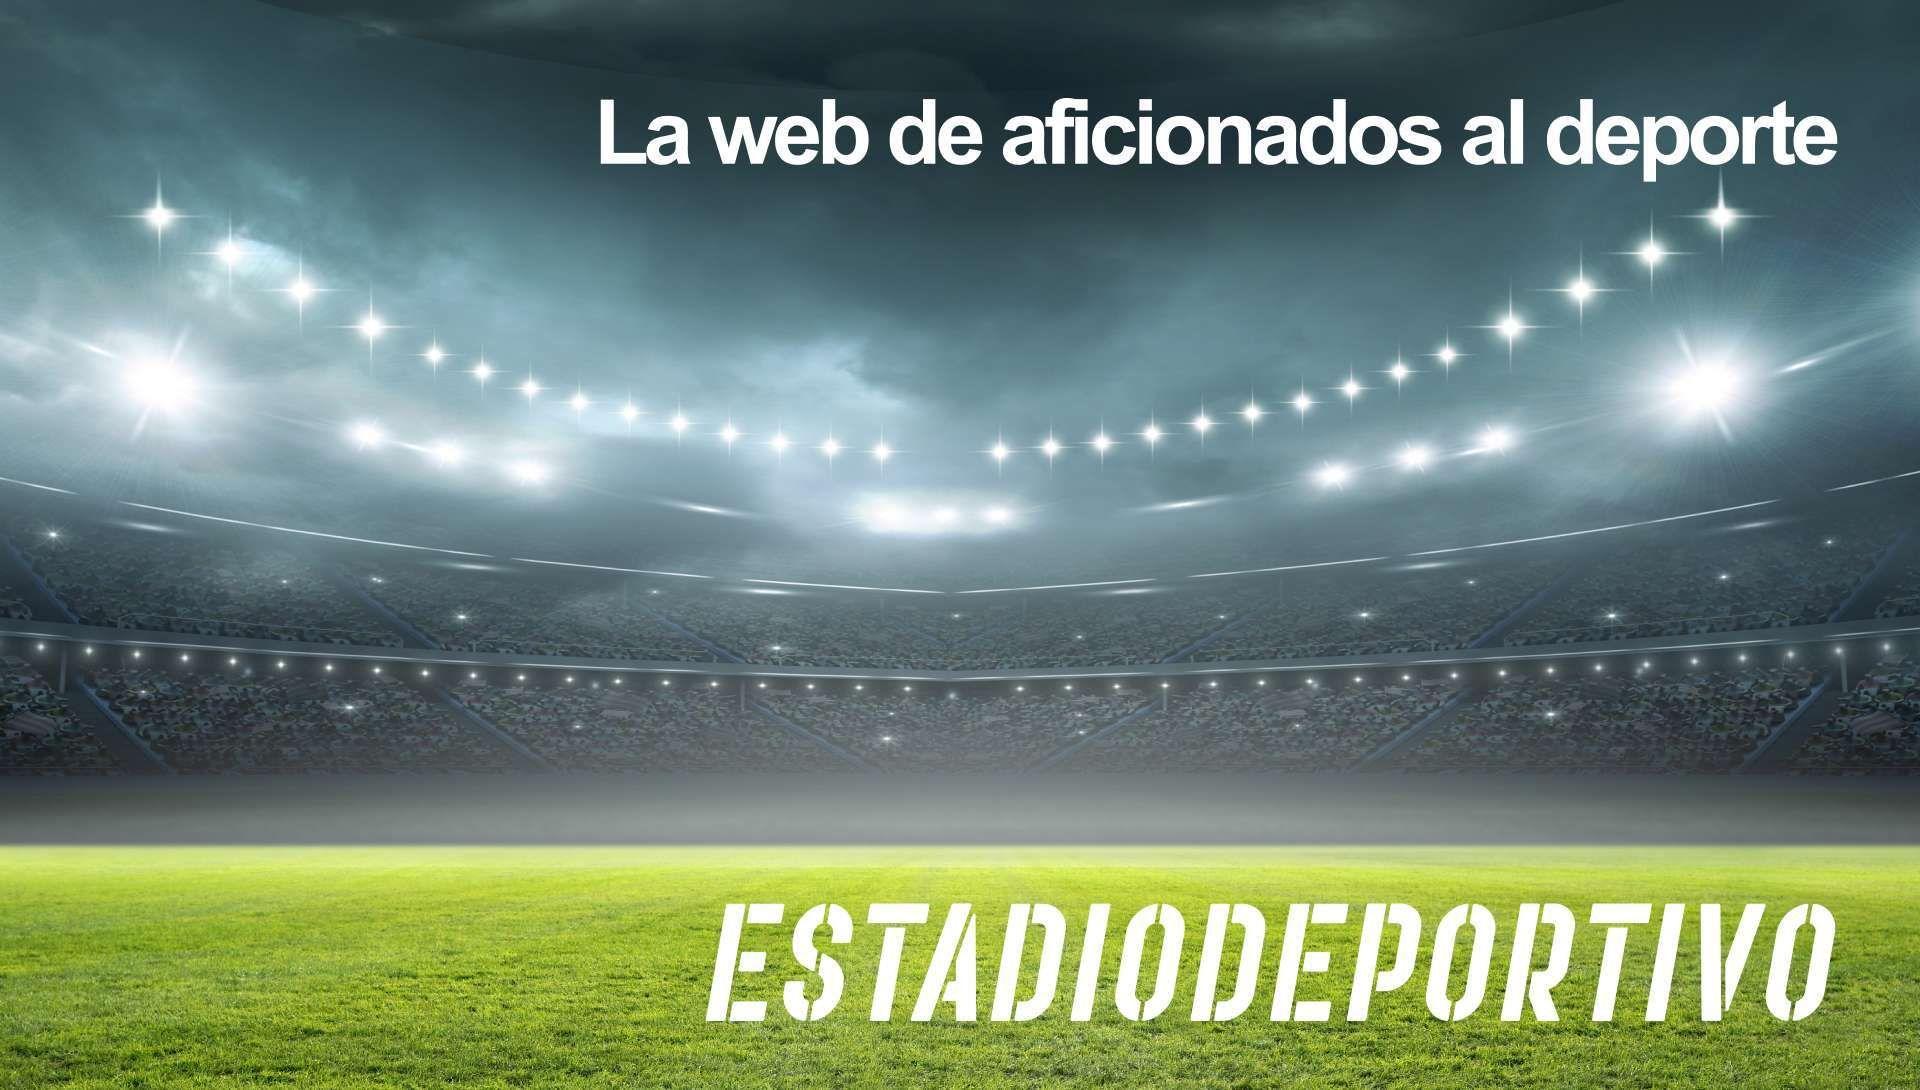 Portadas de la prensa deportiva del sábado 9 de enero